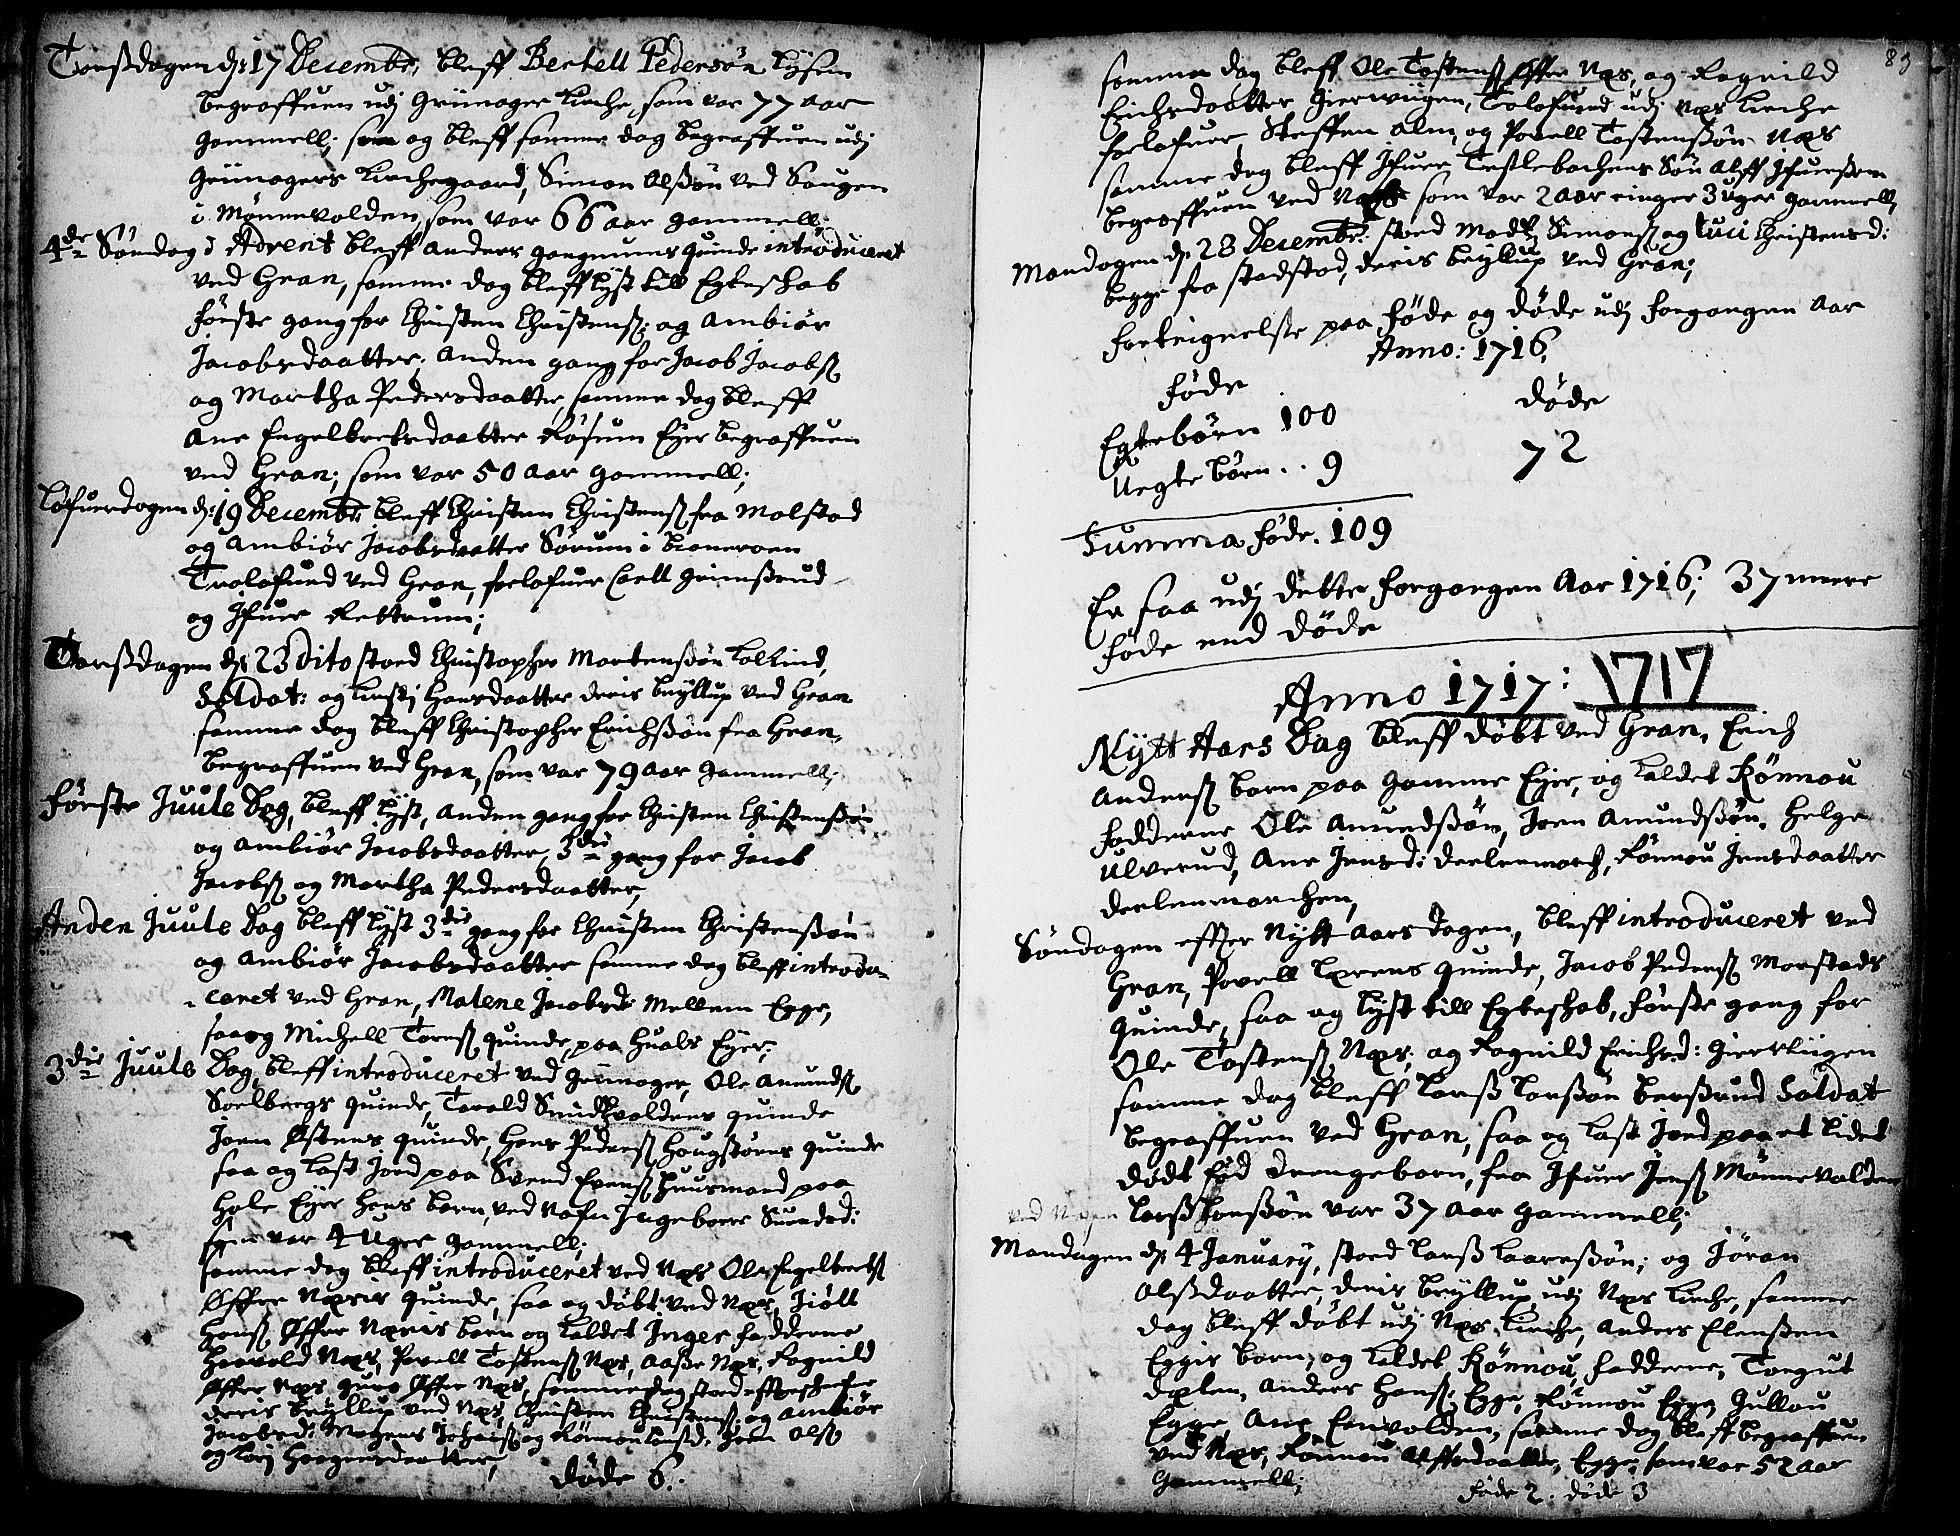 SAH, Gran prestekontor, Ministerialbok nr. 1, 1707-1731, s. 83